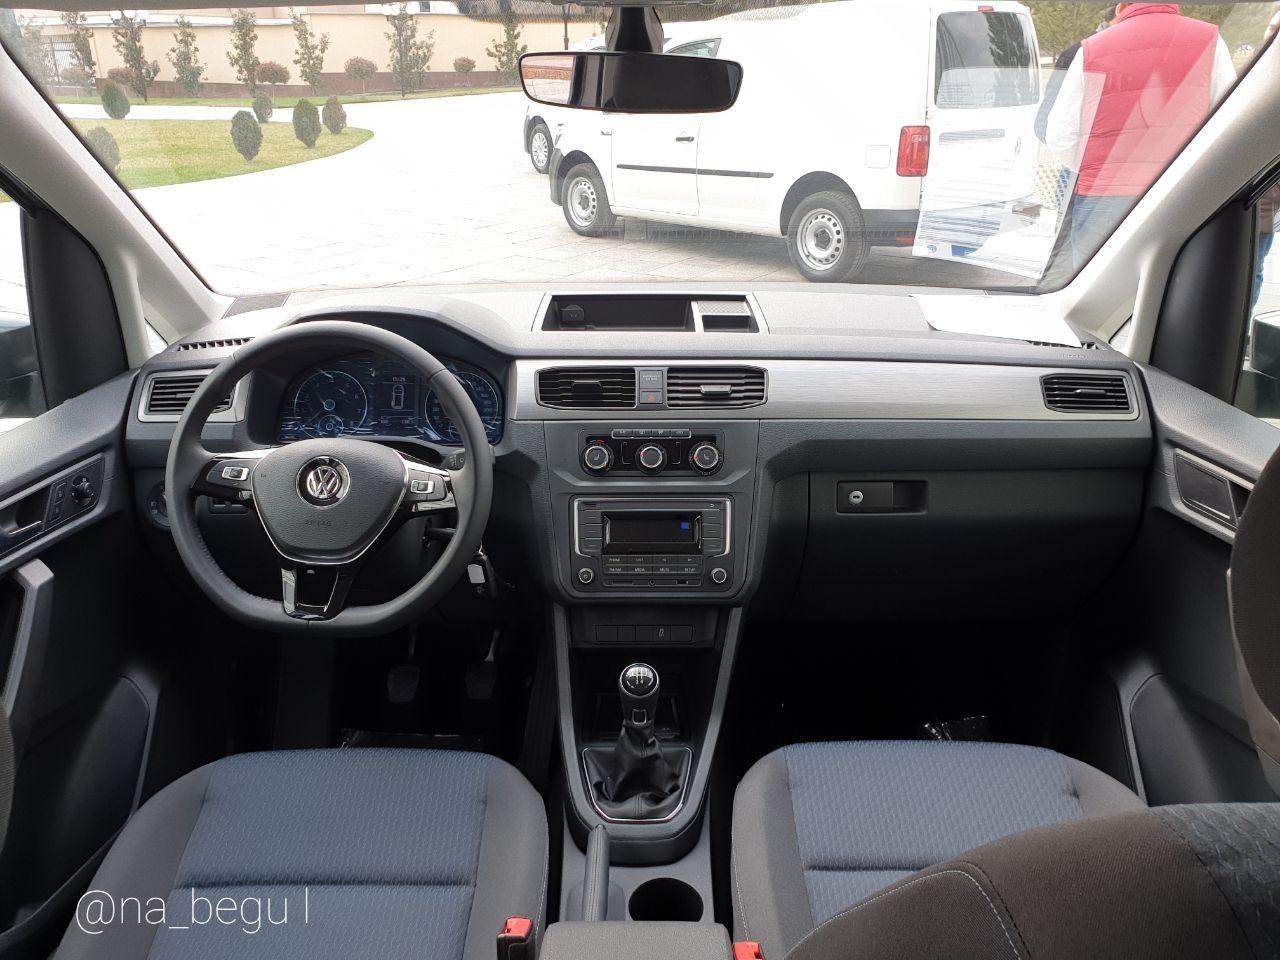 Volkswagen Caddy Narxi - Цена на Кэдди в Узбекистане - 17